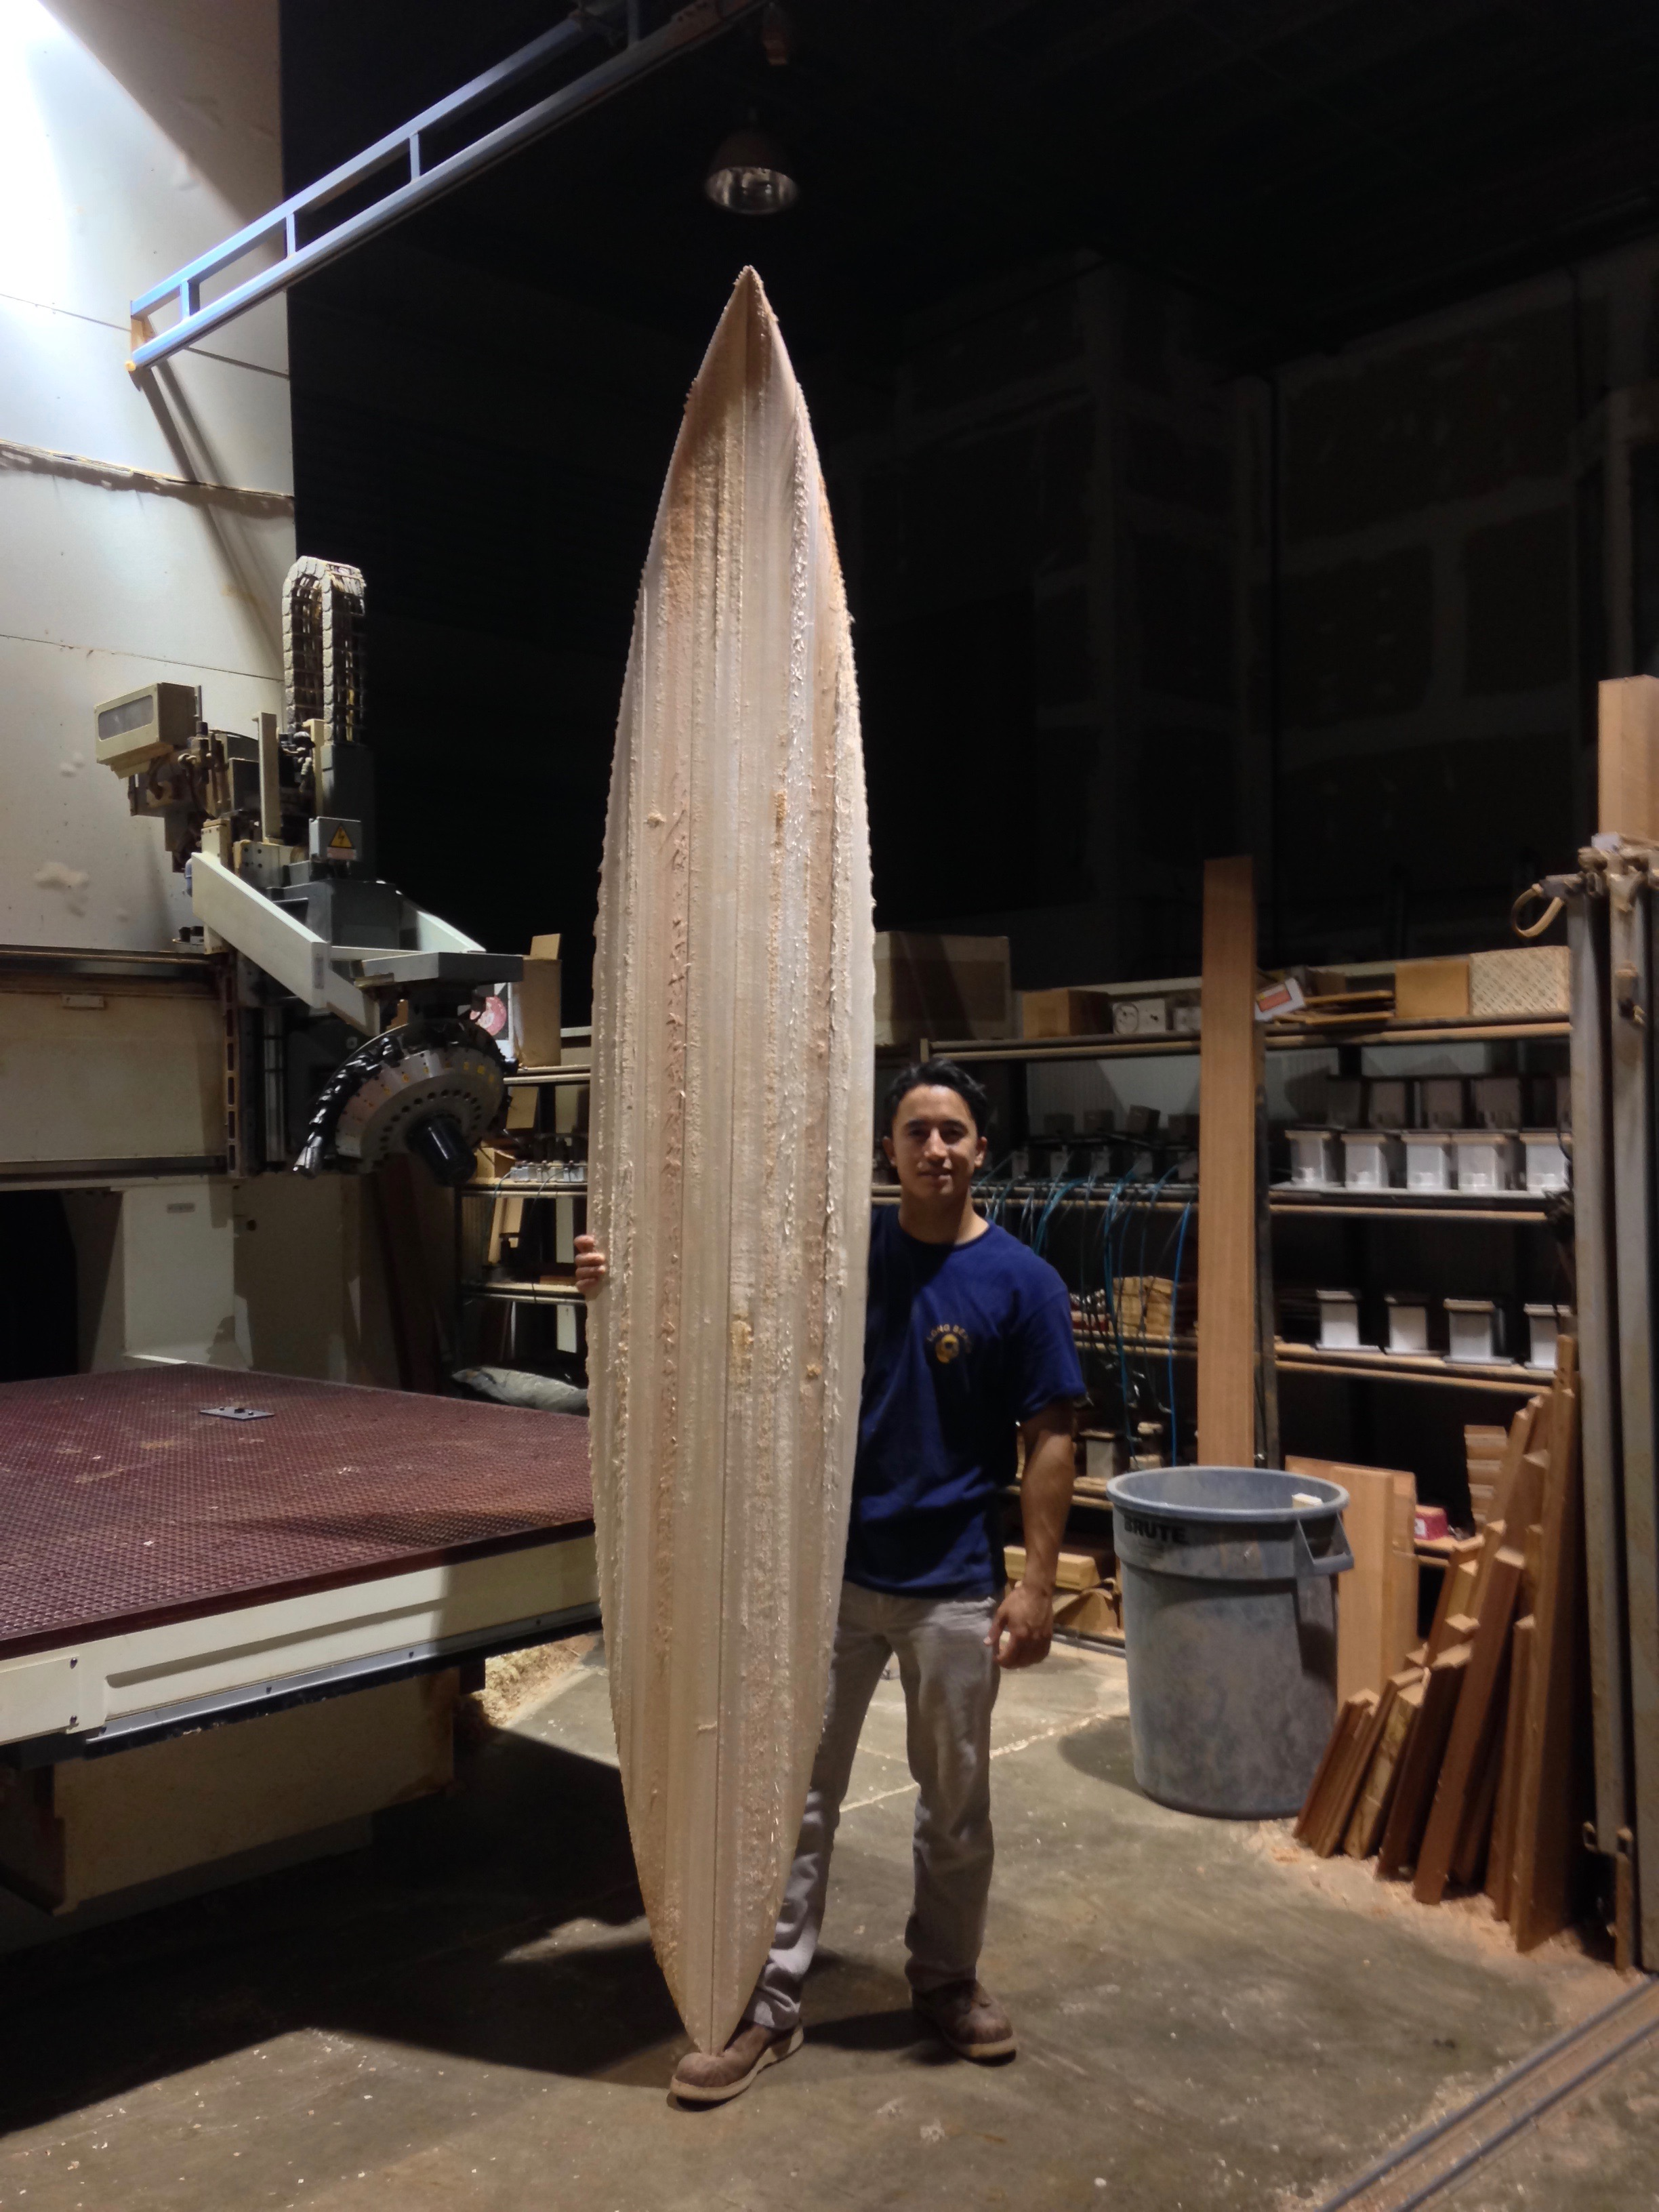 Chambered Surfboard